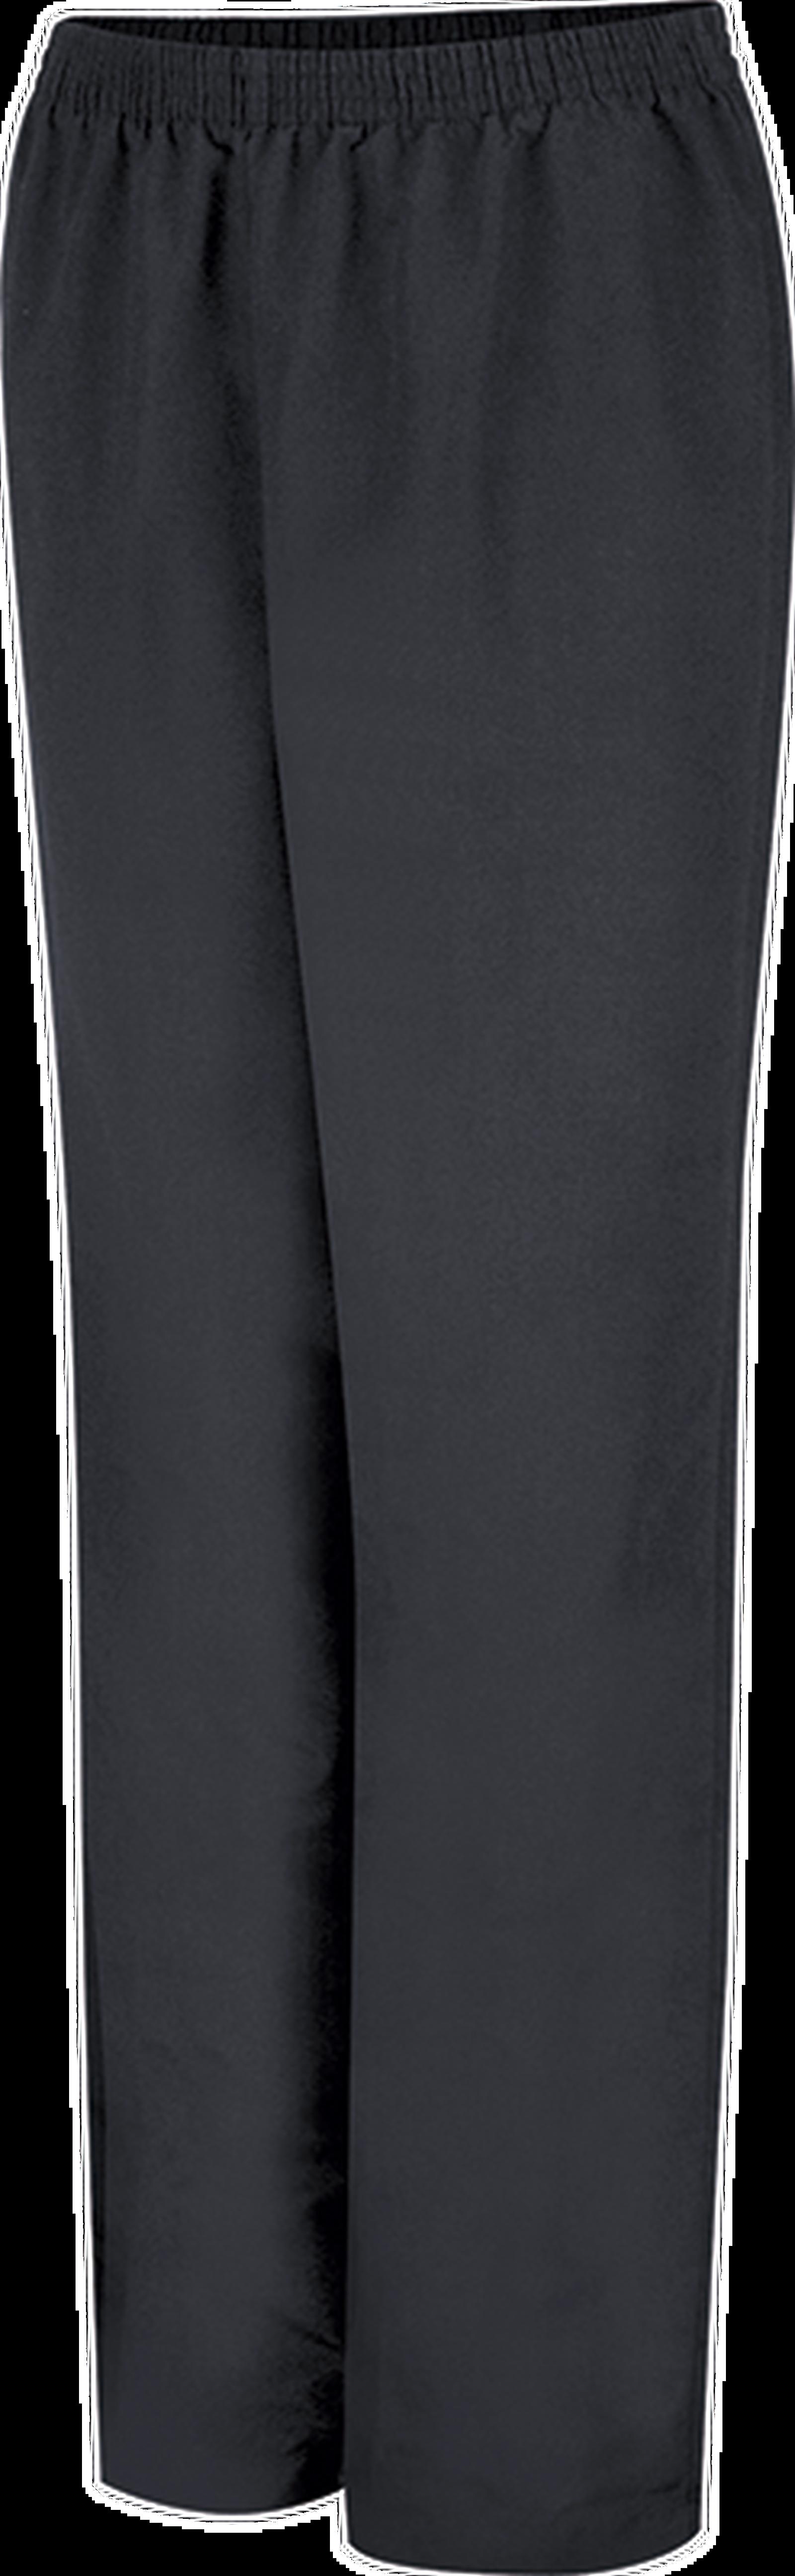 Women's Microfiber Pull-On Pant